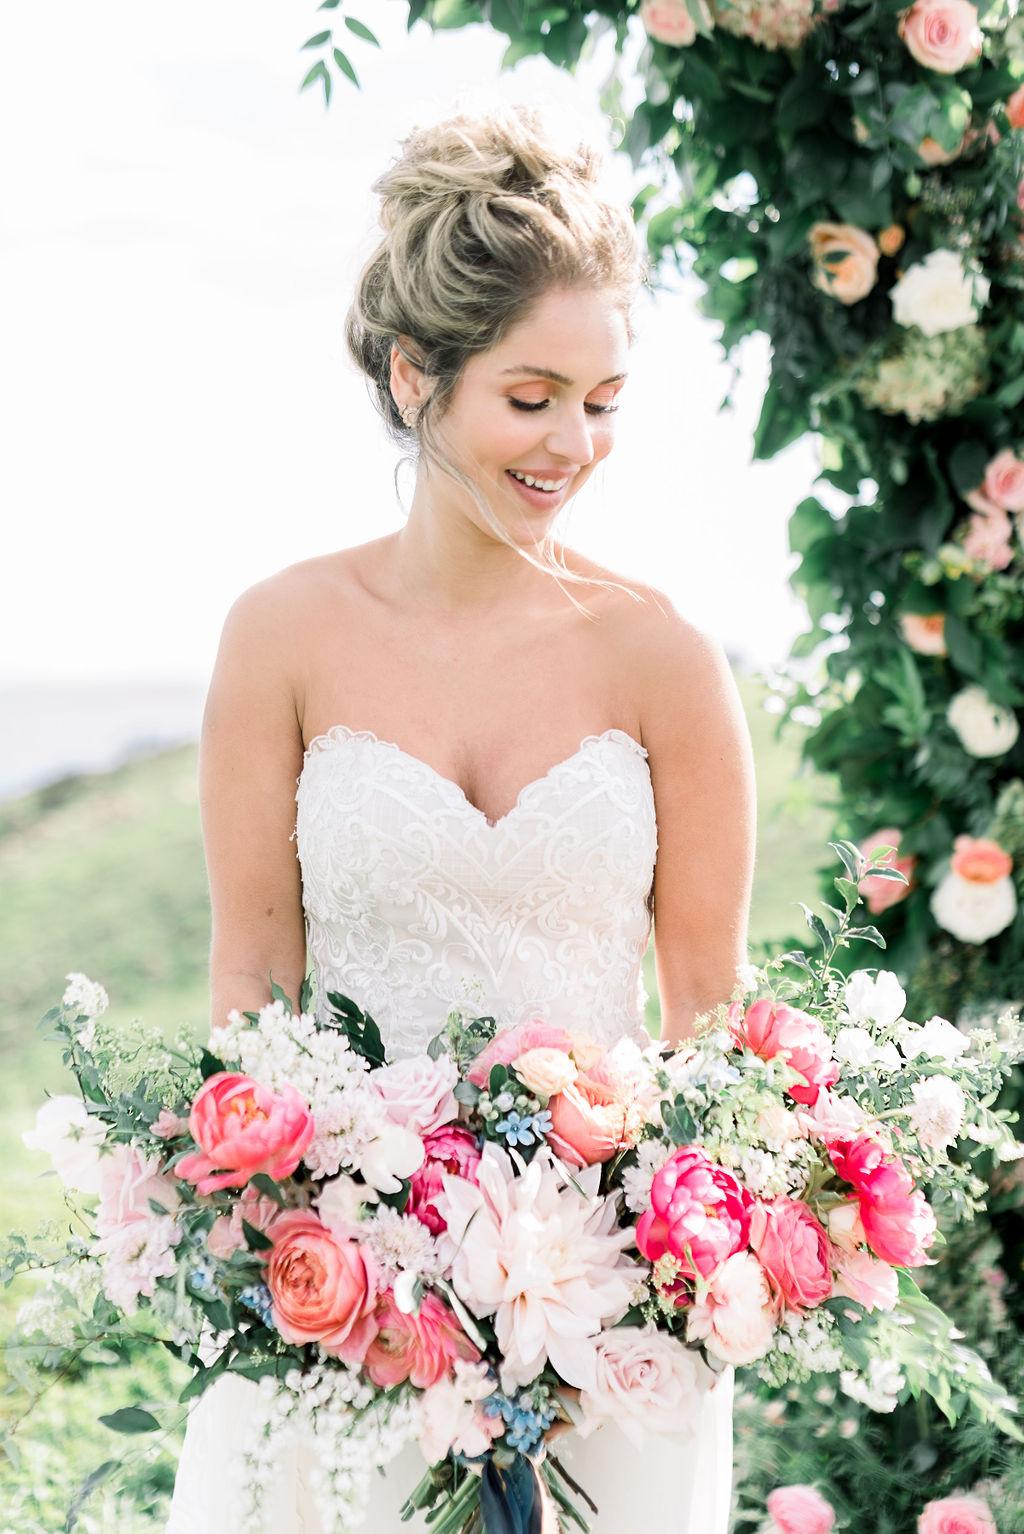 Royal Bee Flower Co. Bridal Bouquet at Deer Creek Ridge, Malibu